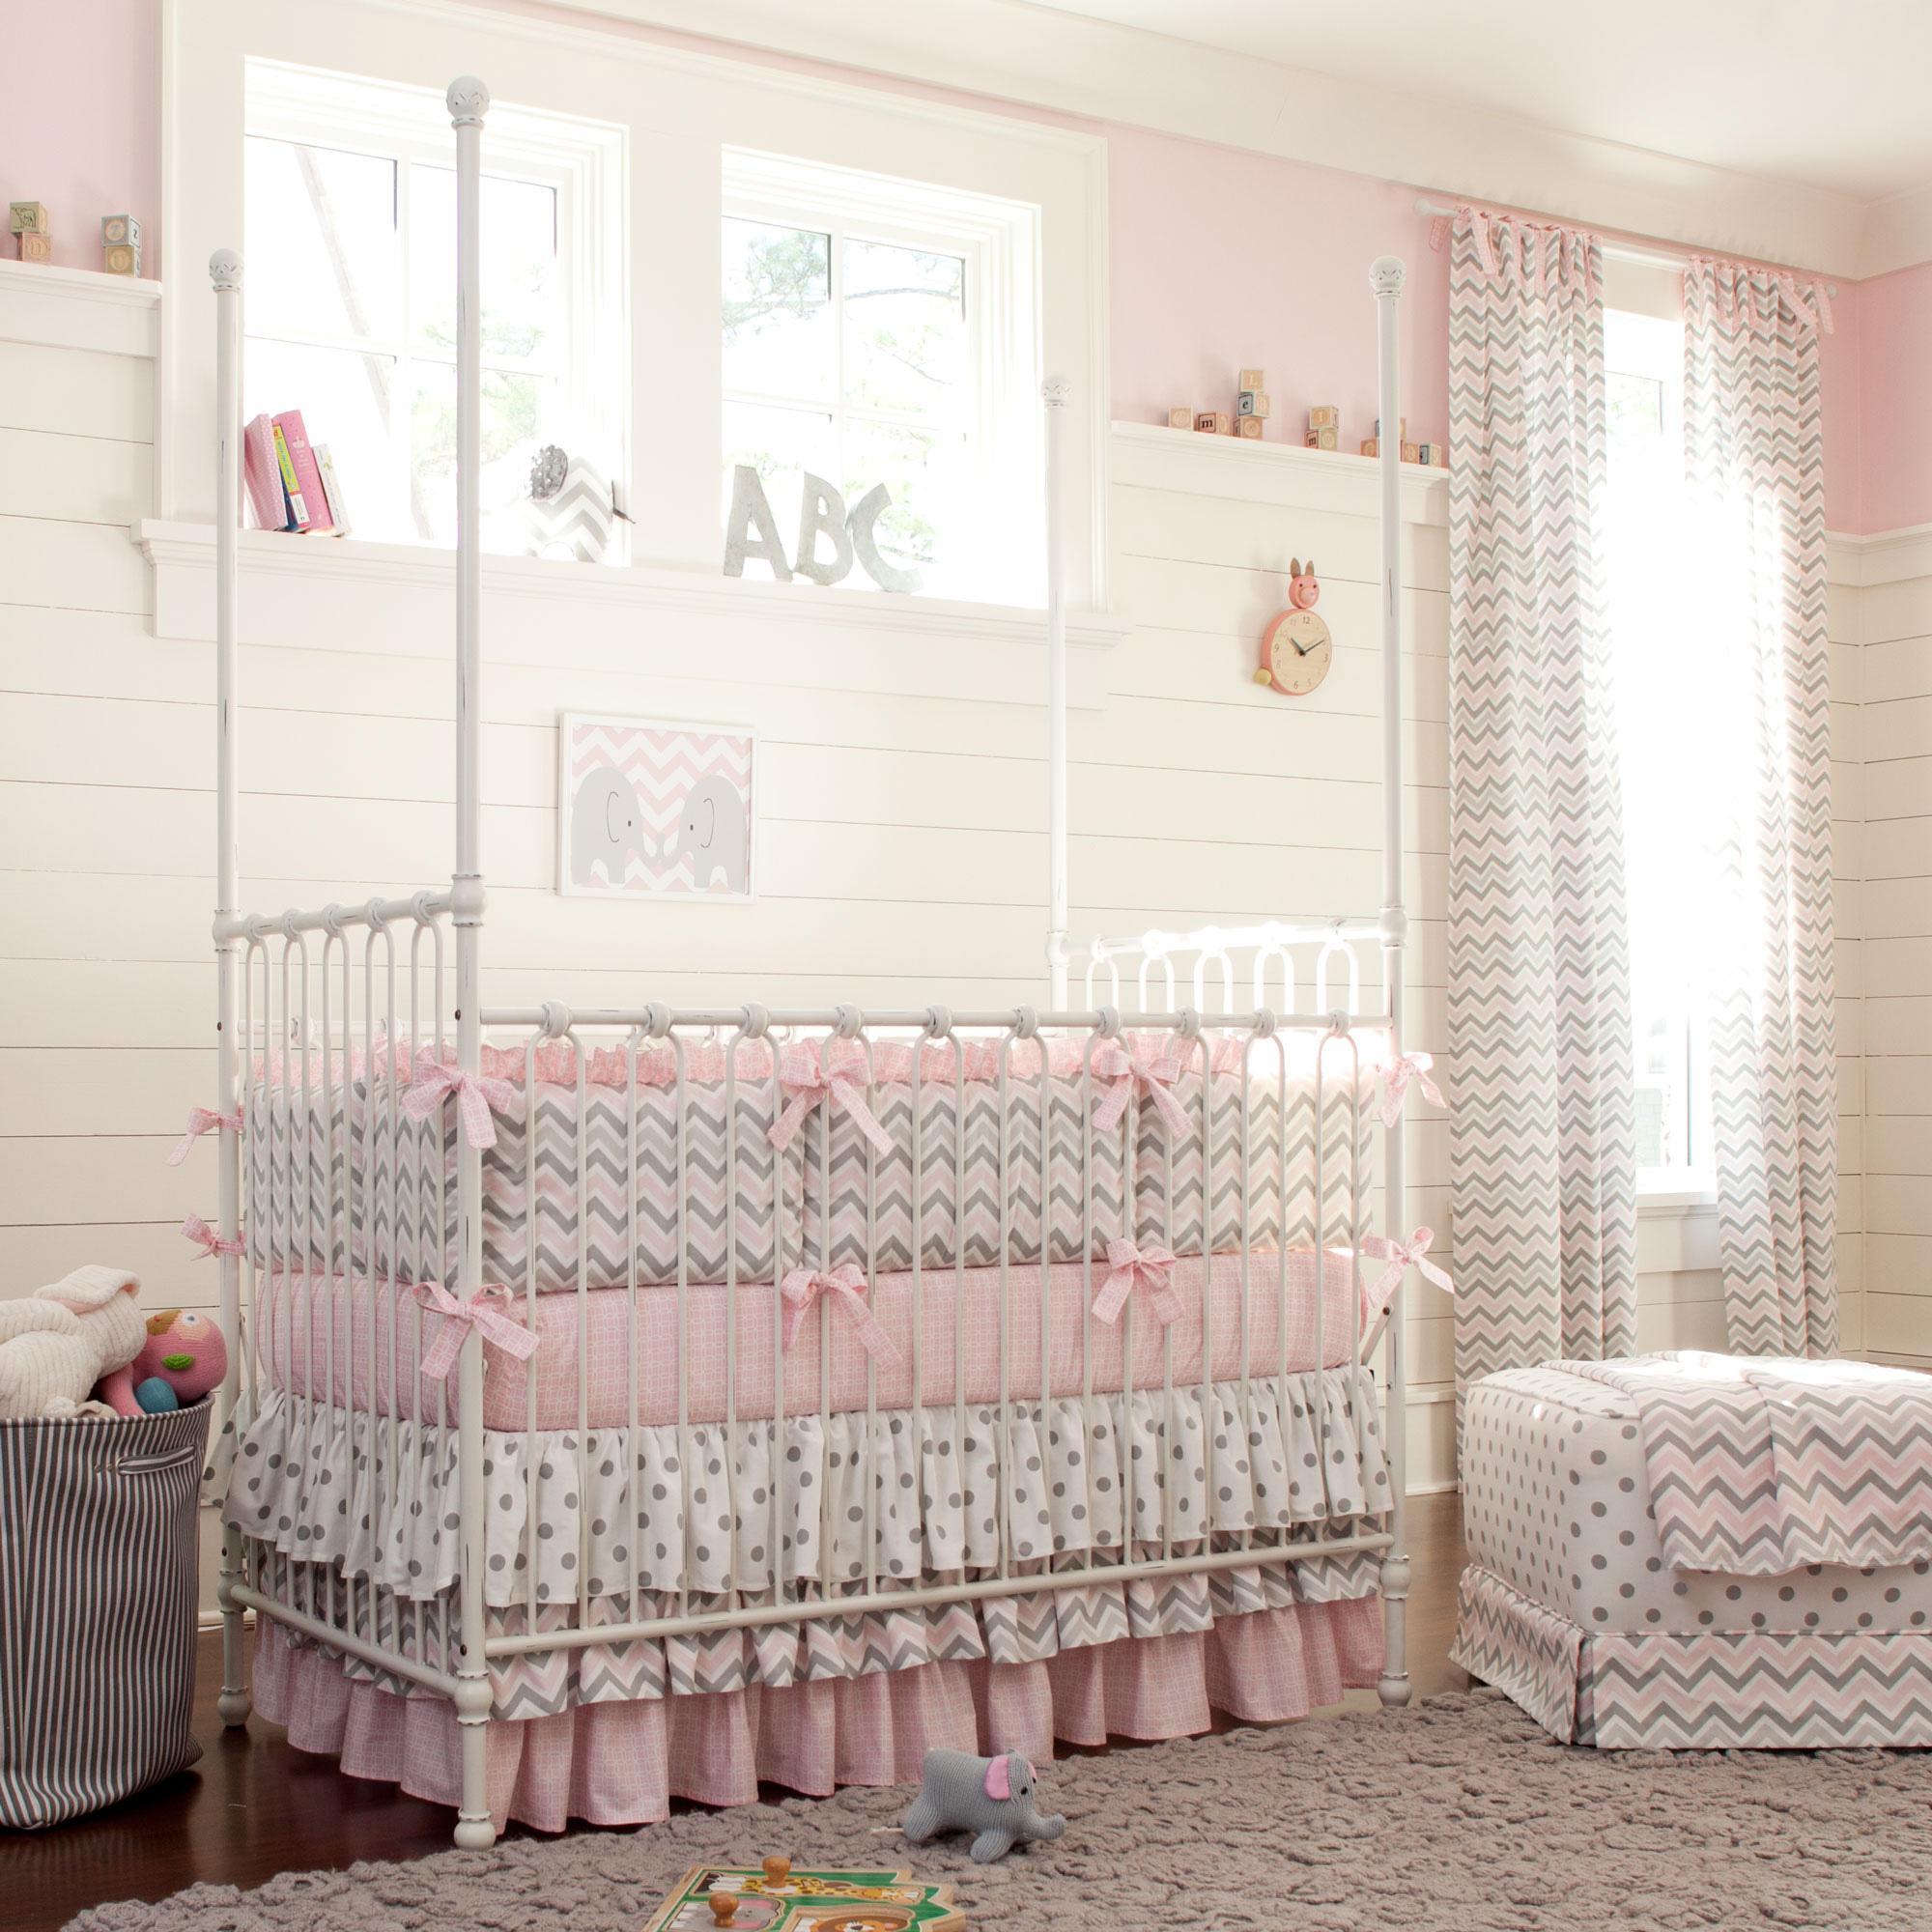 crib bedding for girls pink and gray chevron baby crib bedding TELXAGT